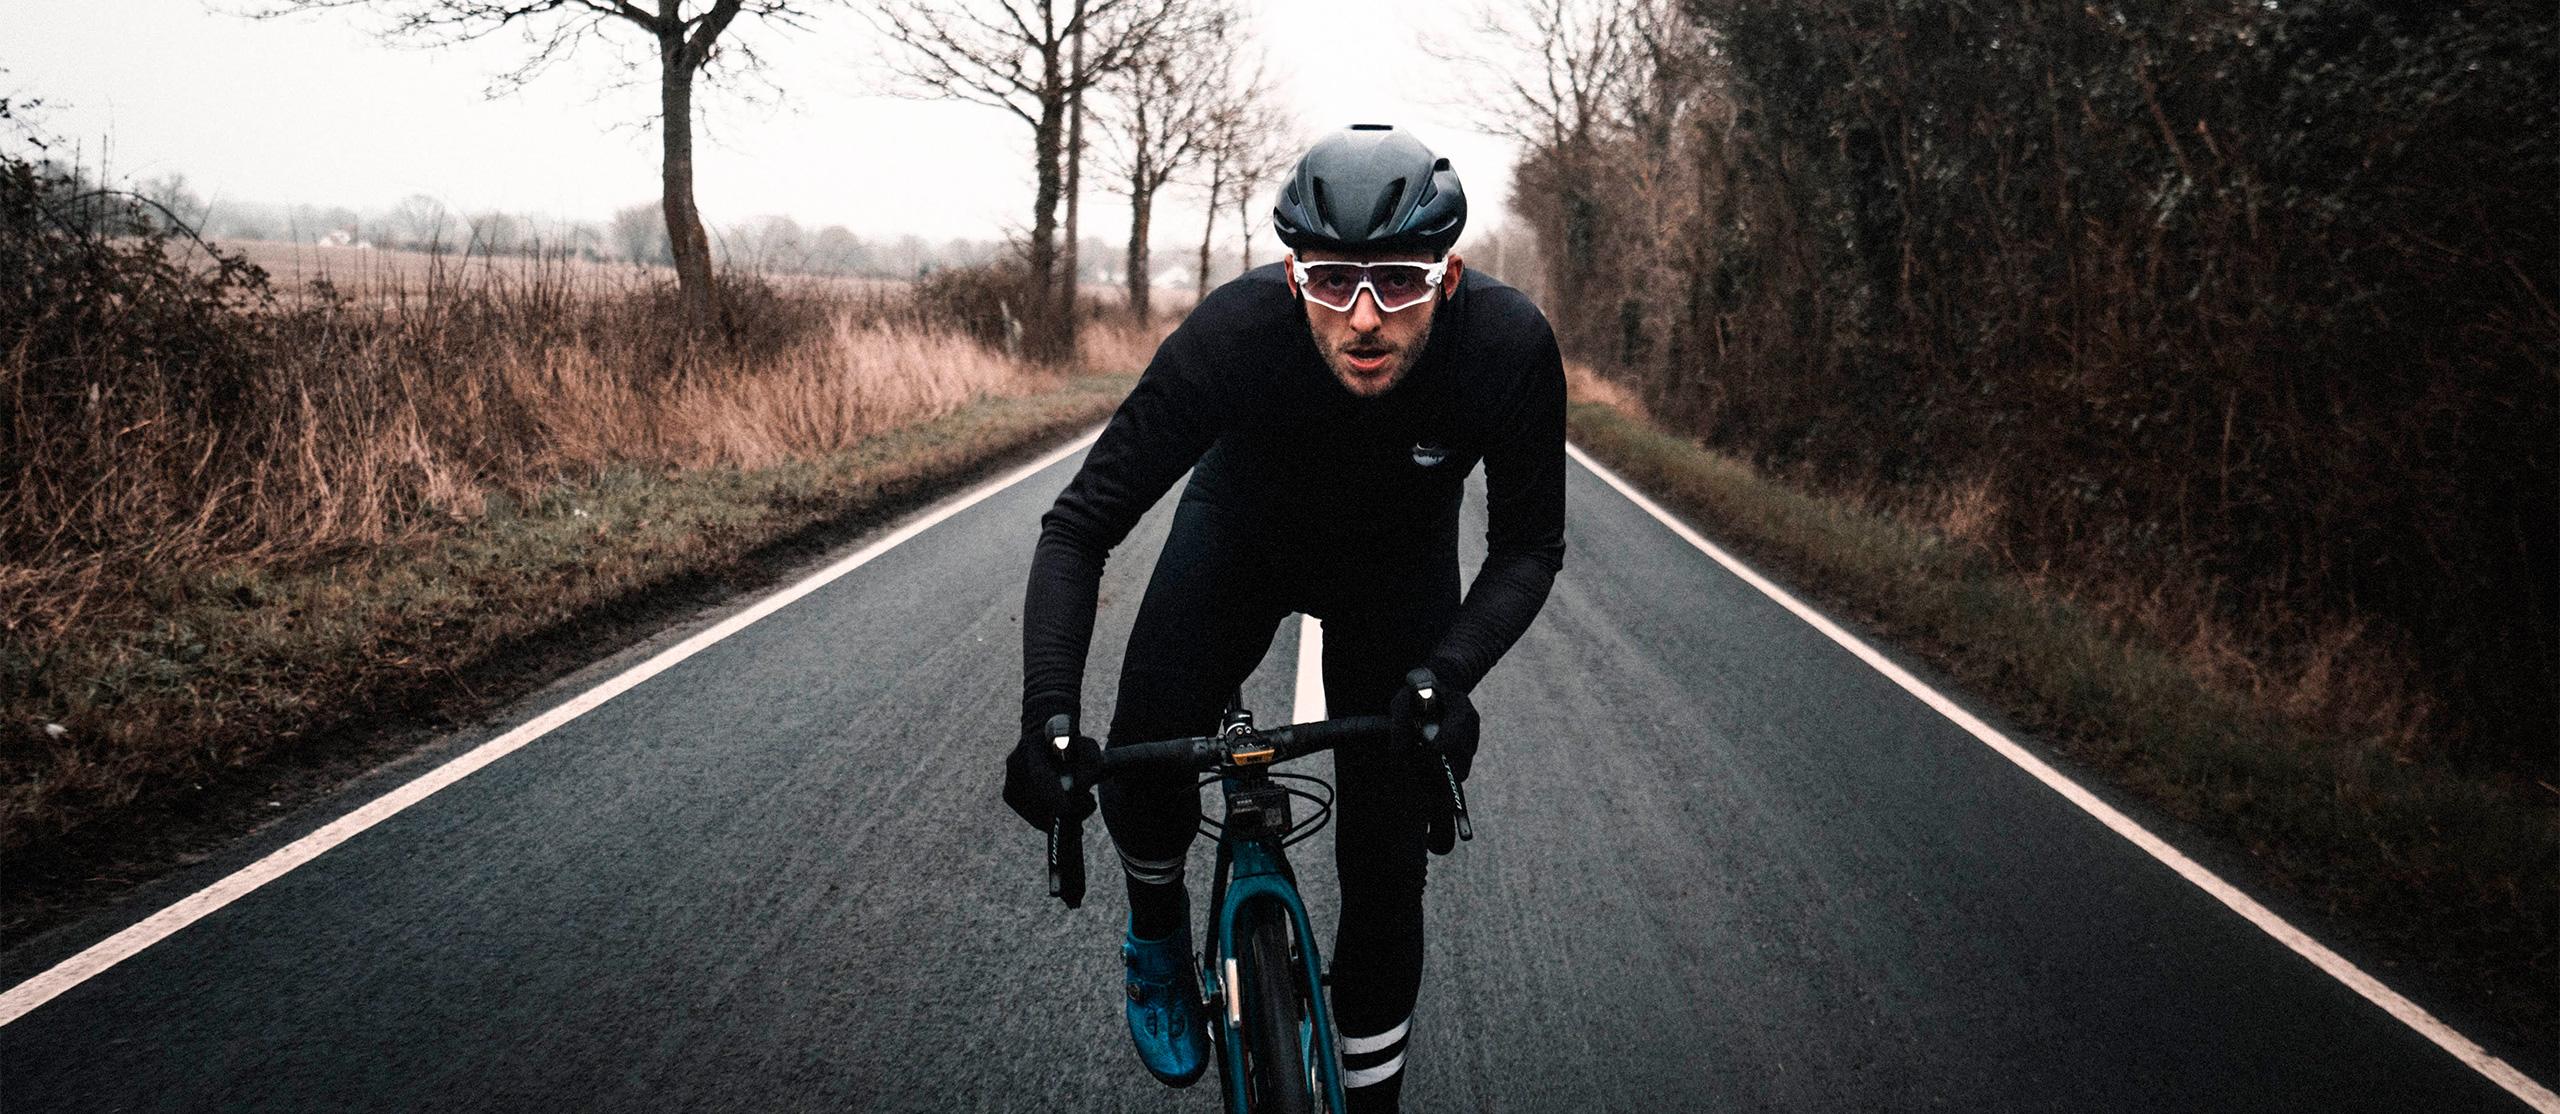 MET Helmets Specialists in road cycling helmet